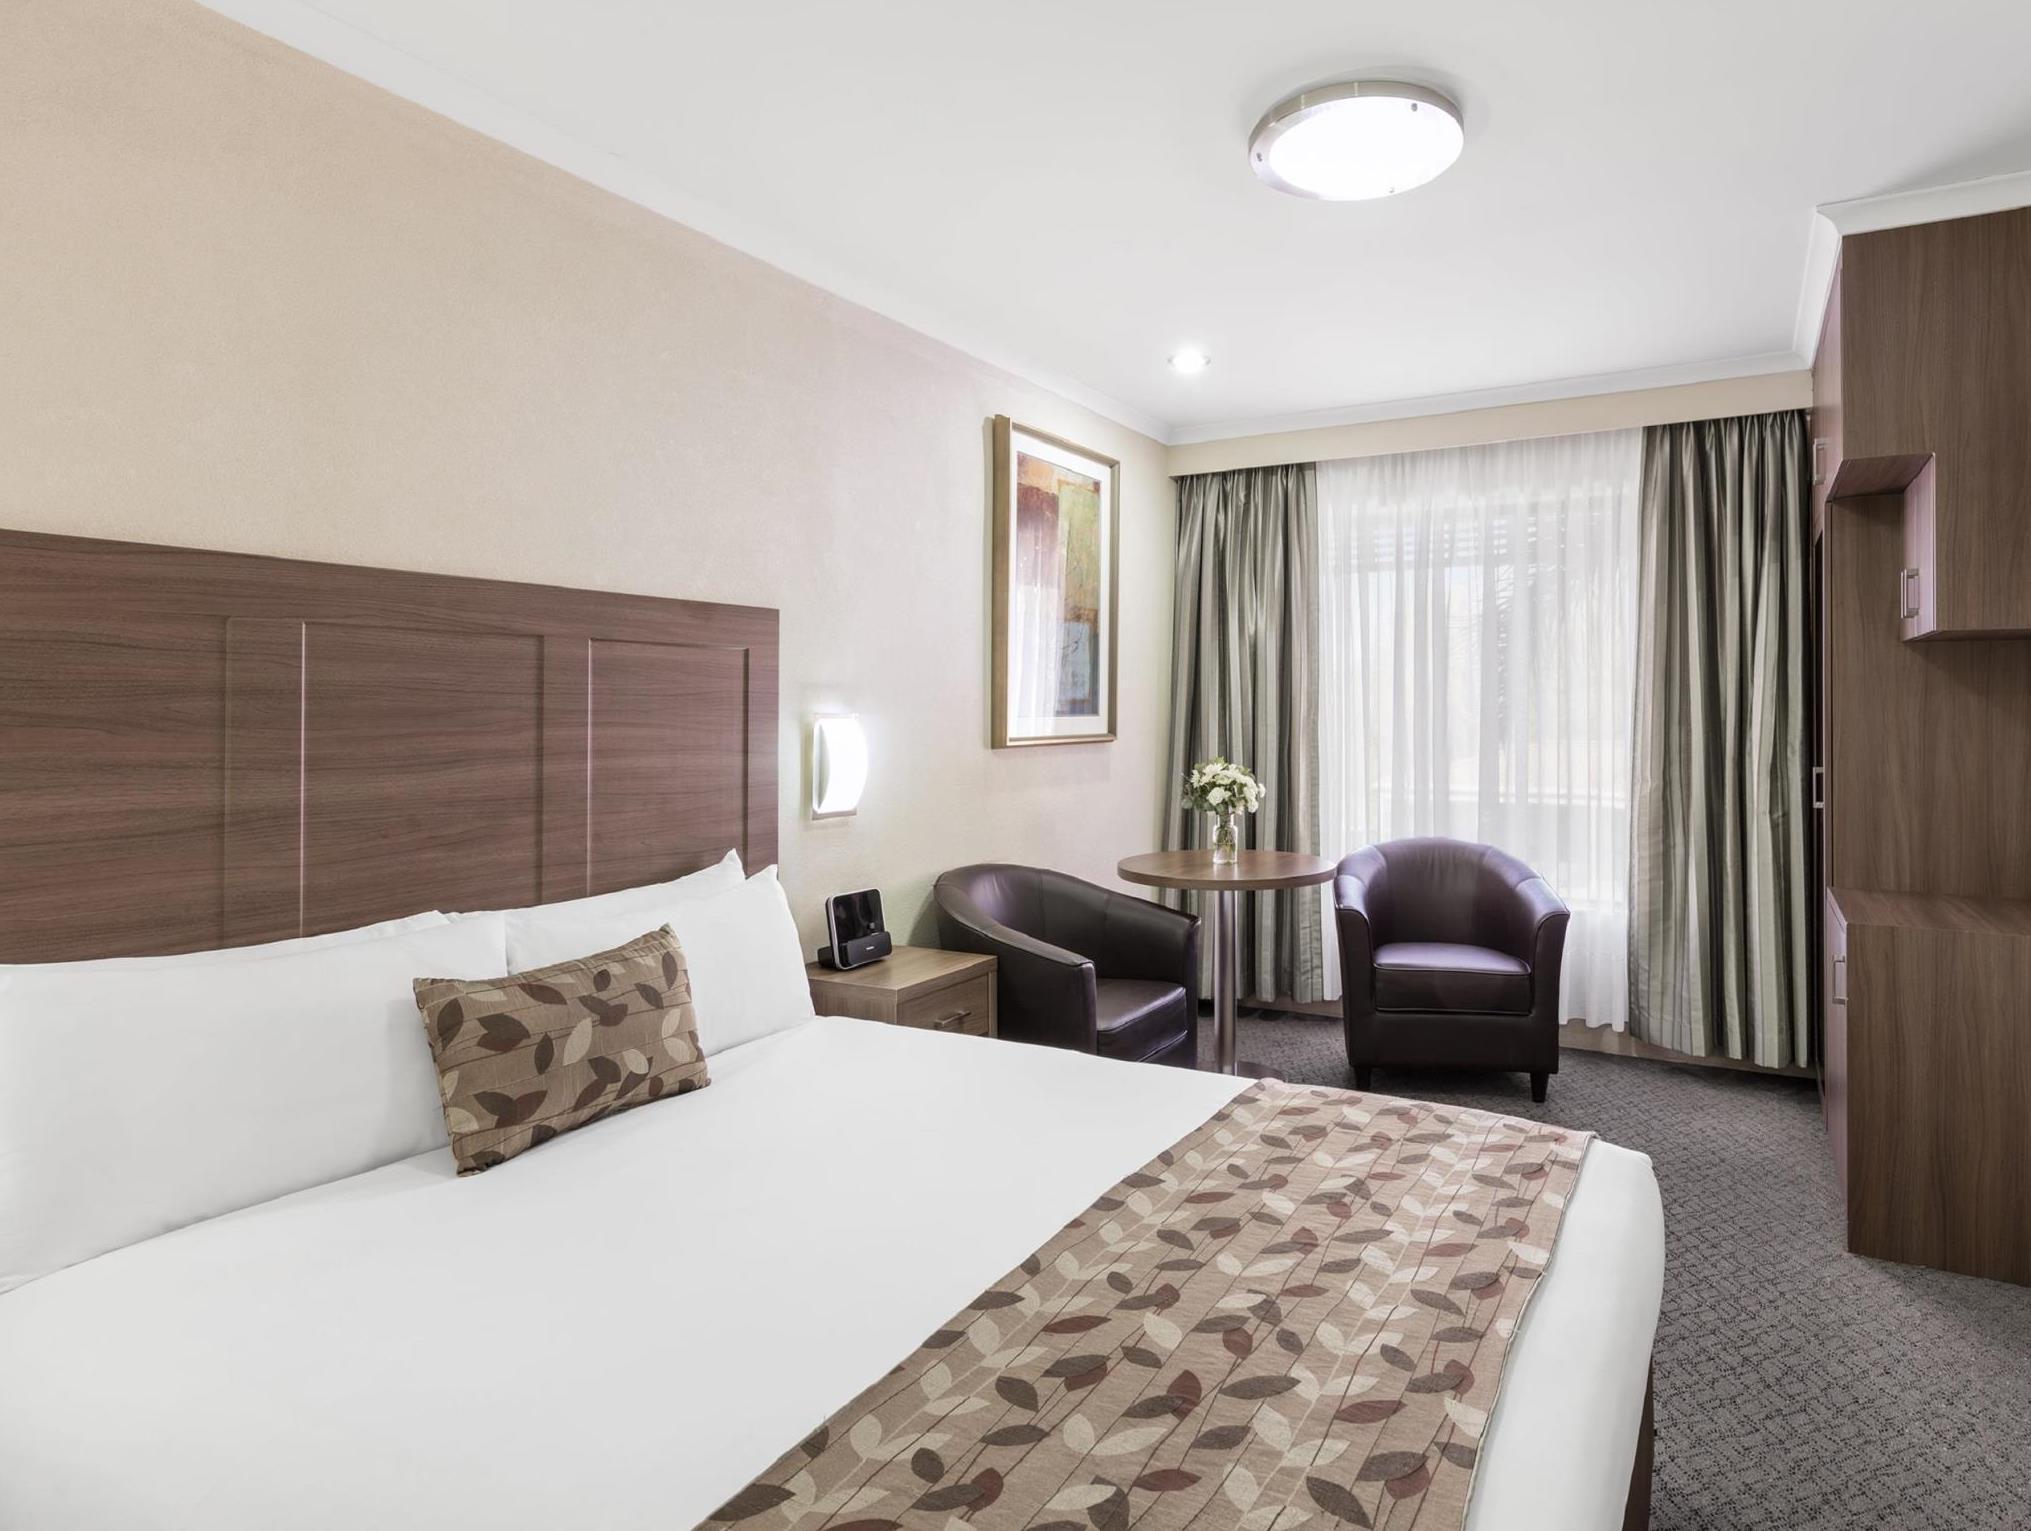 Best Western Plus Garden City Canberra, Narrabundah